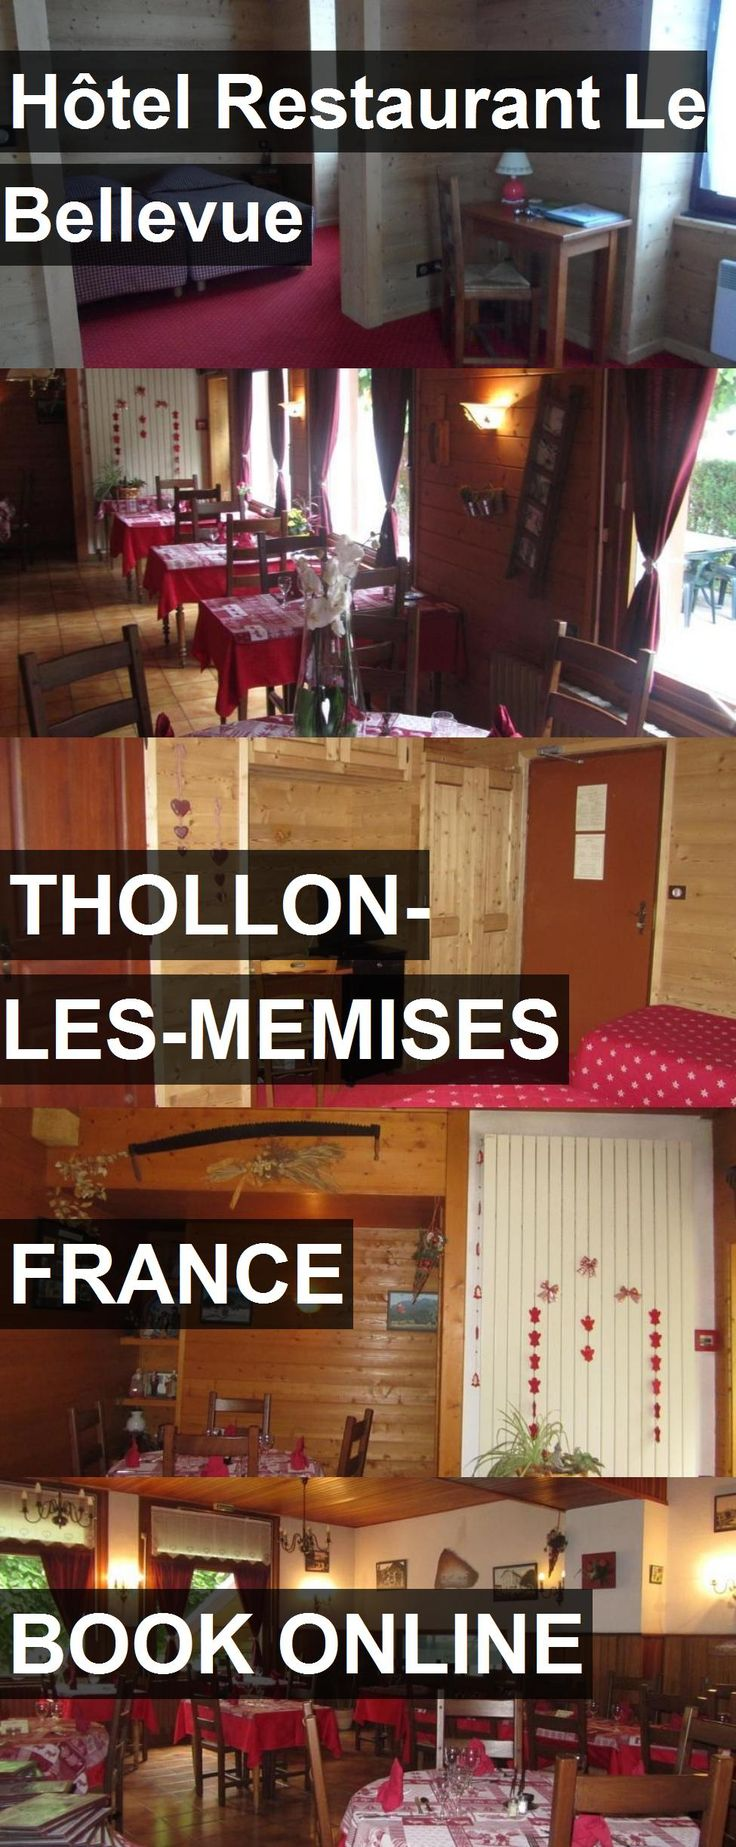 Hotel Hôtel Restaurant Le Bellevue in Thollon-les-Memises, France. For more information, photos, reviews and best prices please follow the link. #France #Thollon-les-Memises #hotel #travel #vacation